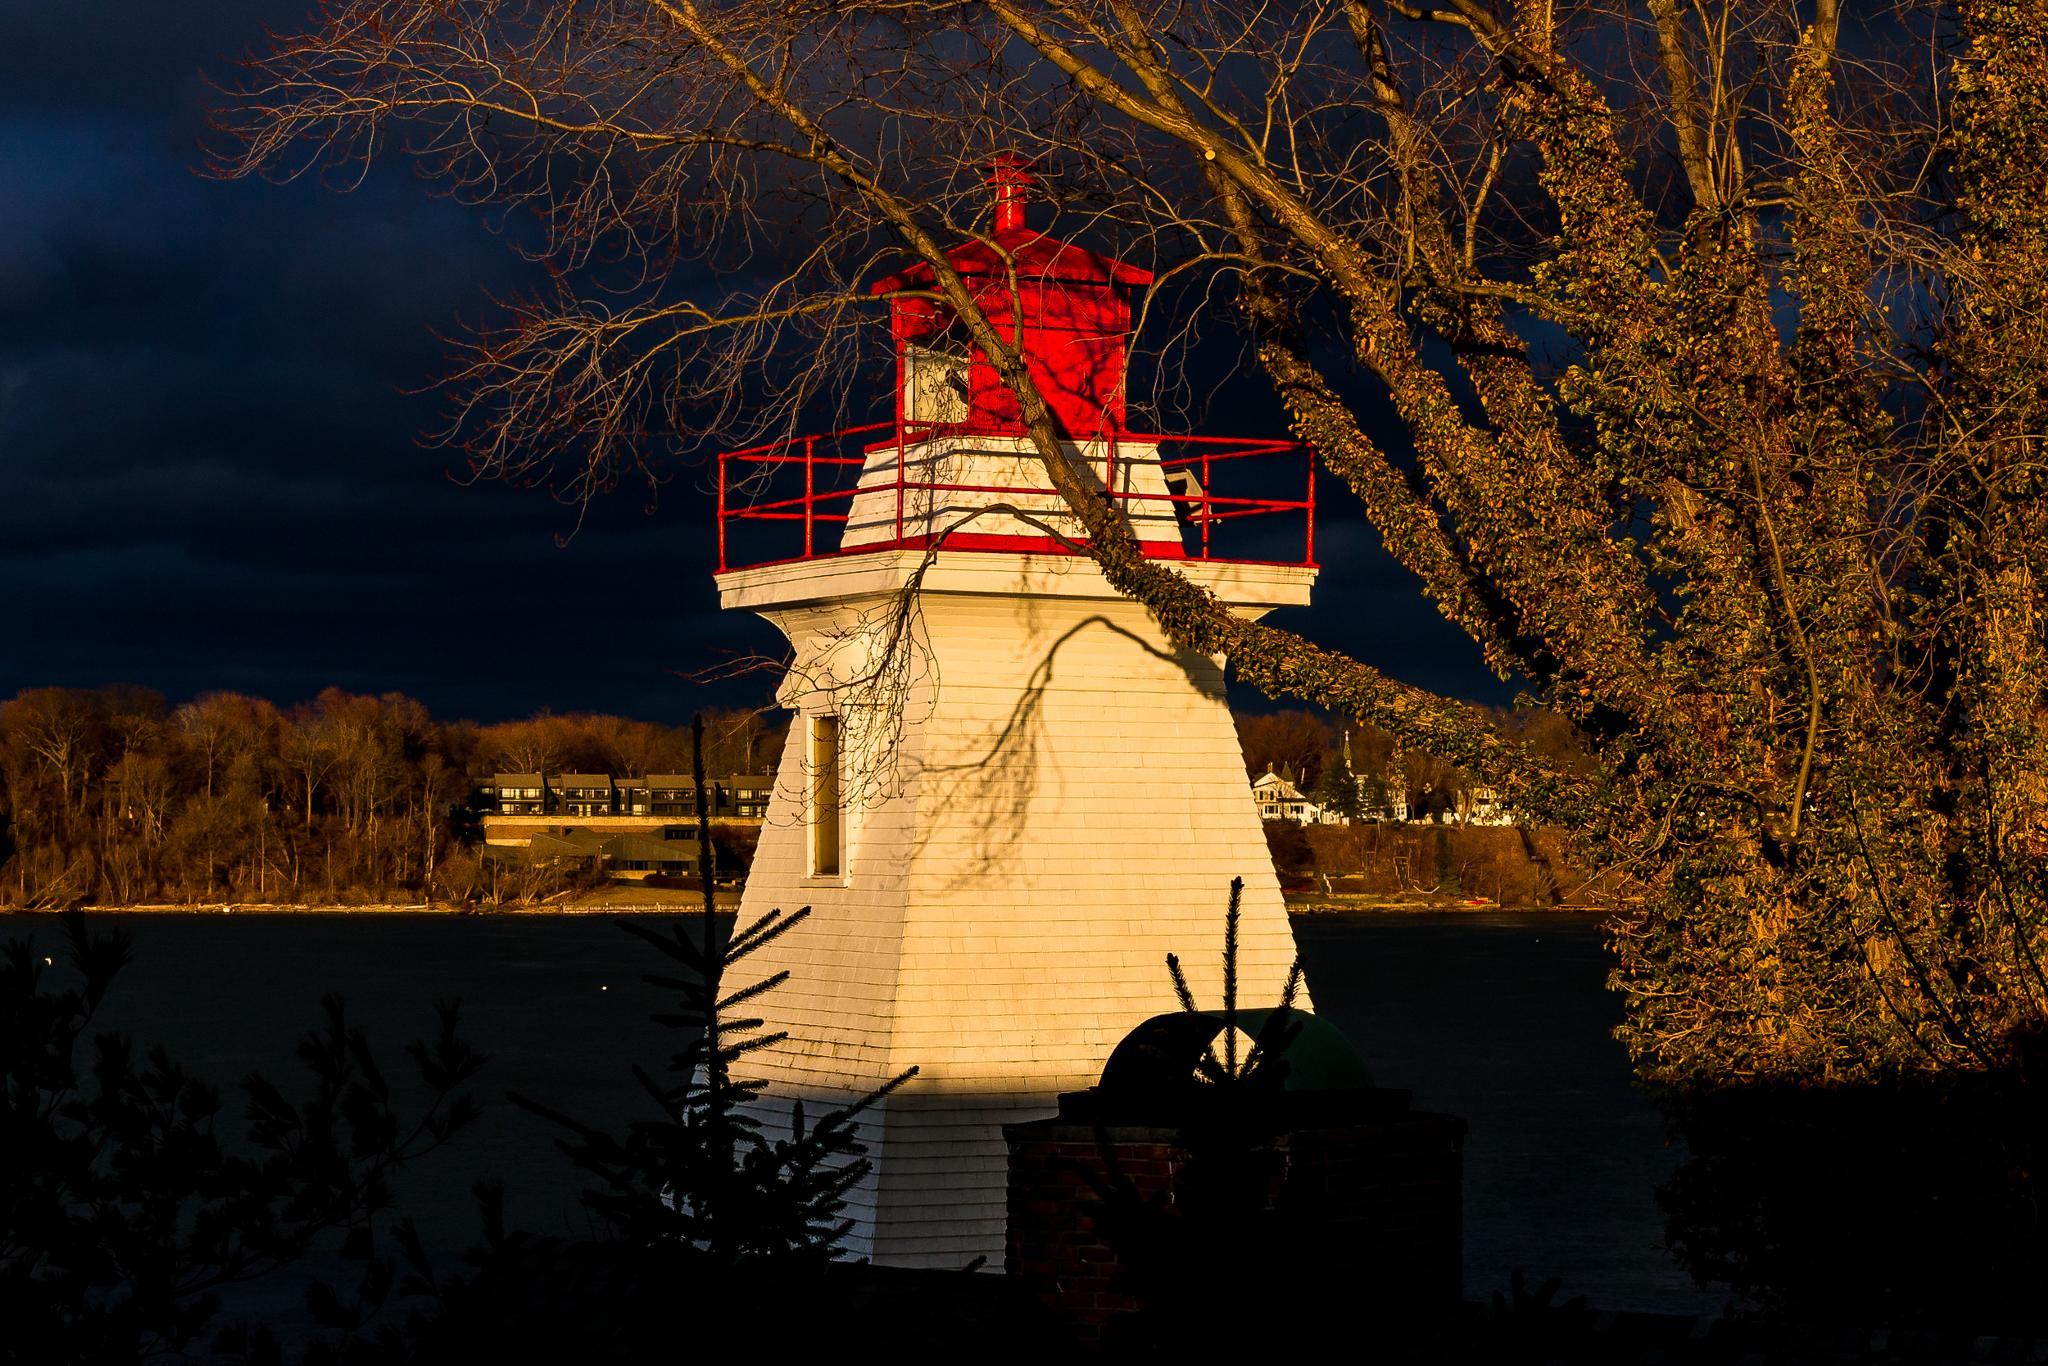 The Pump House Lighthouse by stephenhops